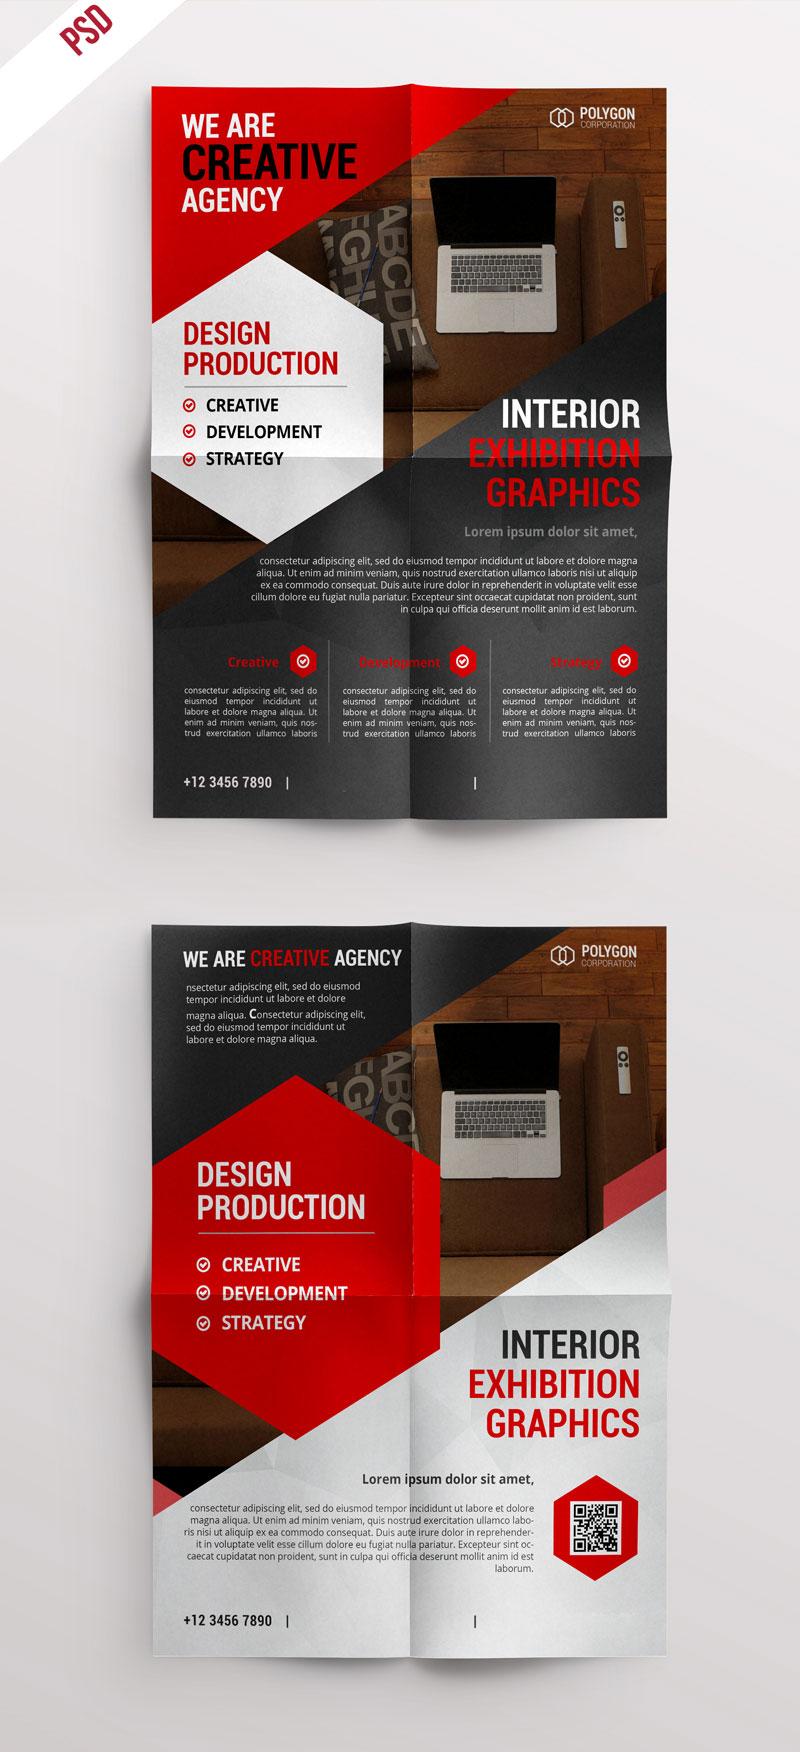 p519 - لایه باز کاتالوگ شرکتی و تراکت معرفی خدمات تبلیغاتی مجموعه های تجاری و اقتصادی